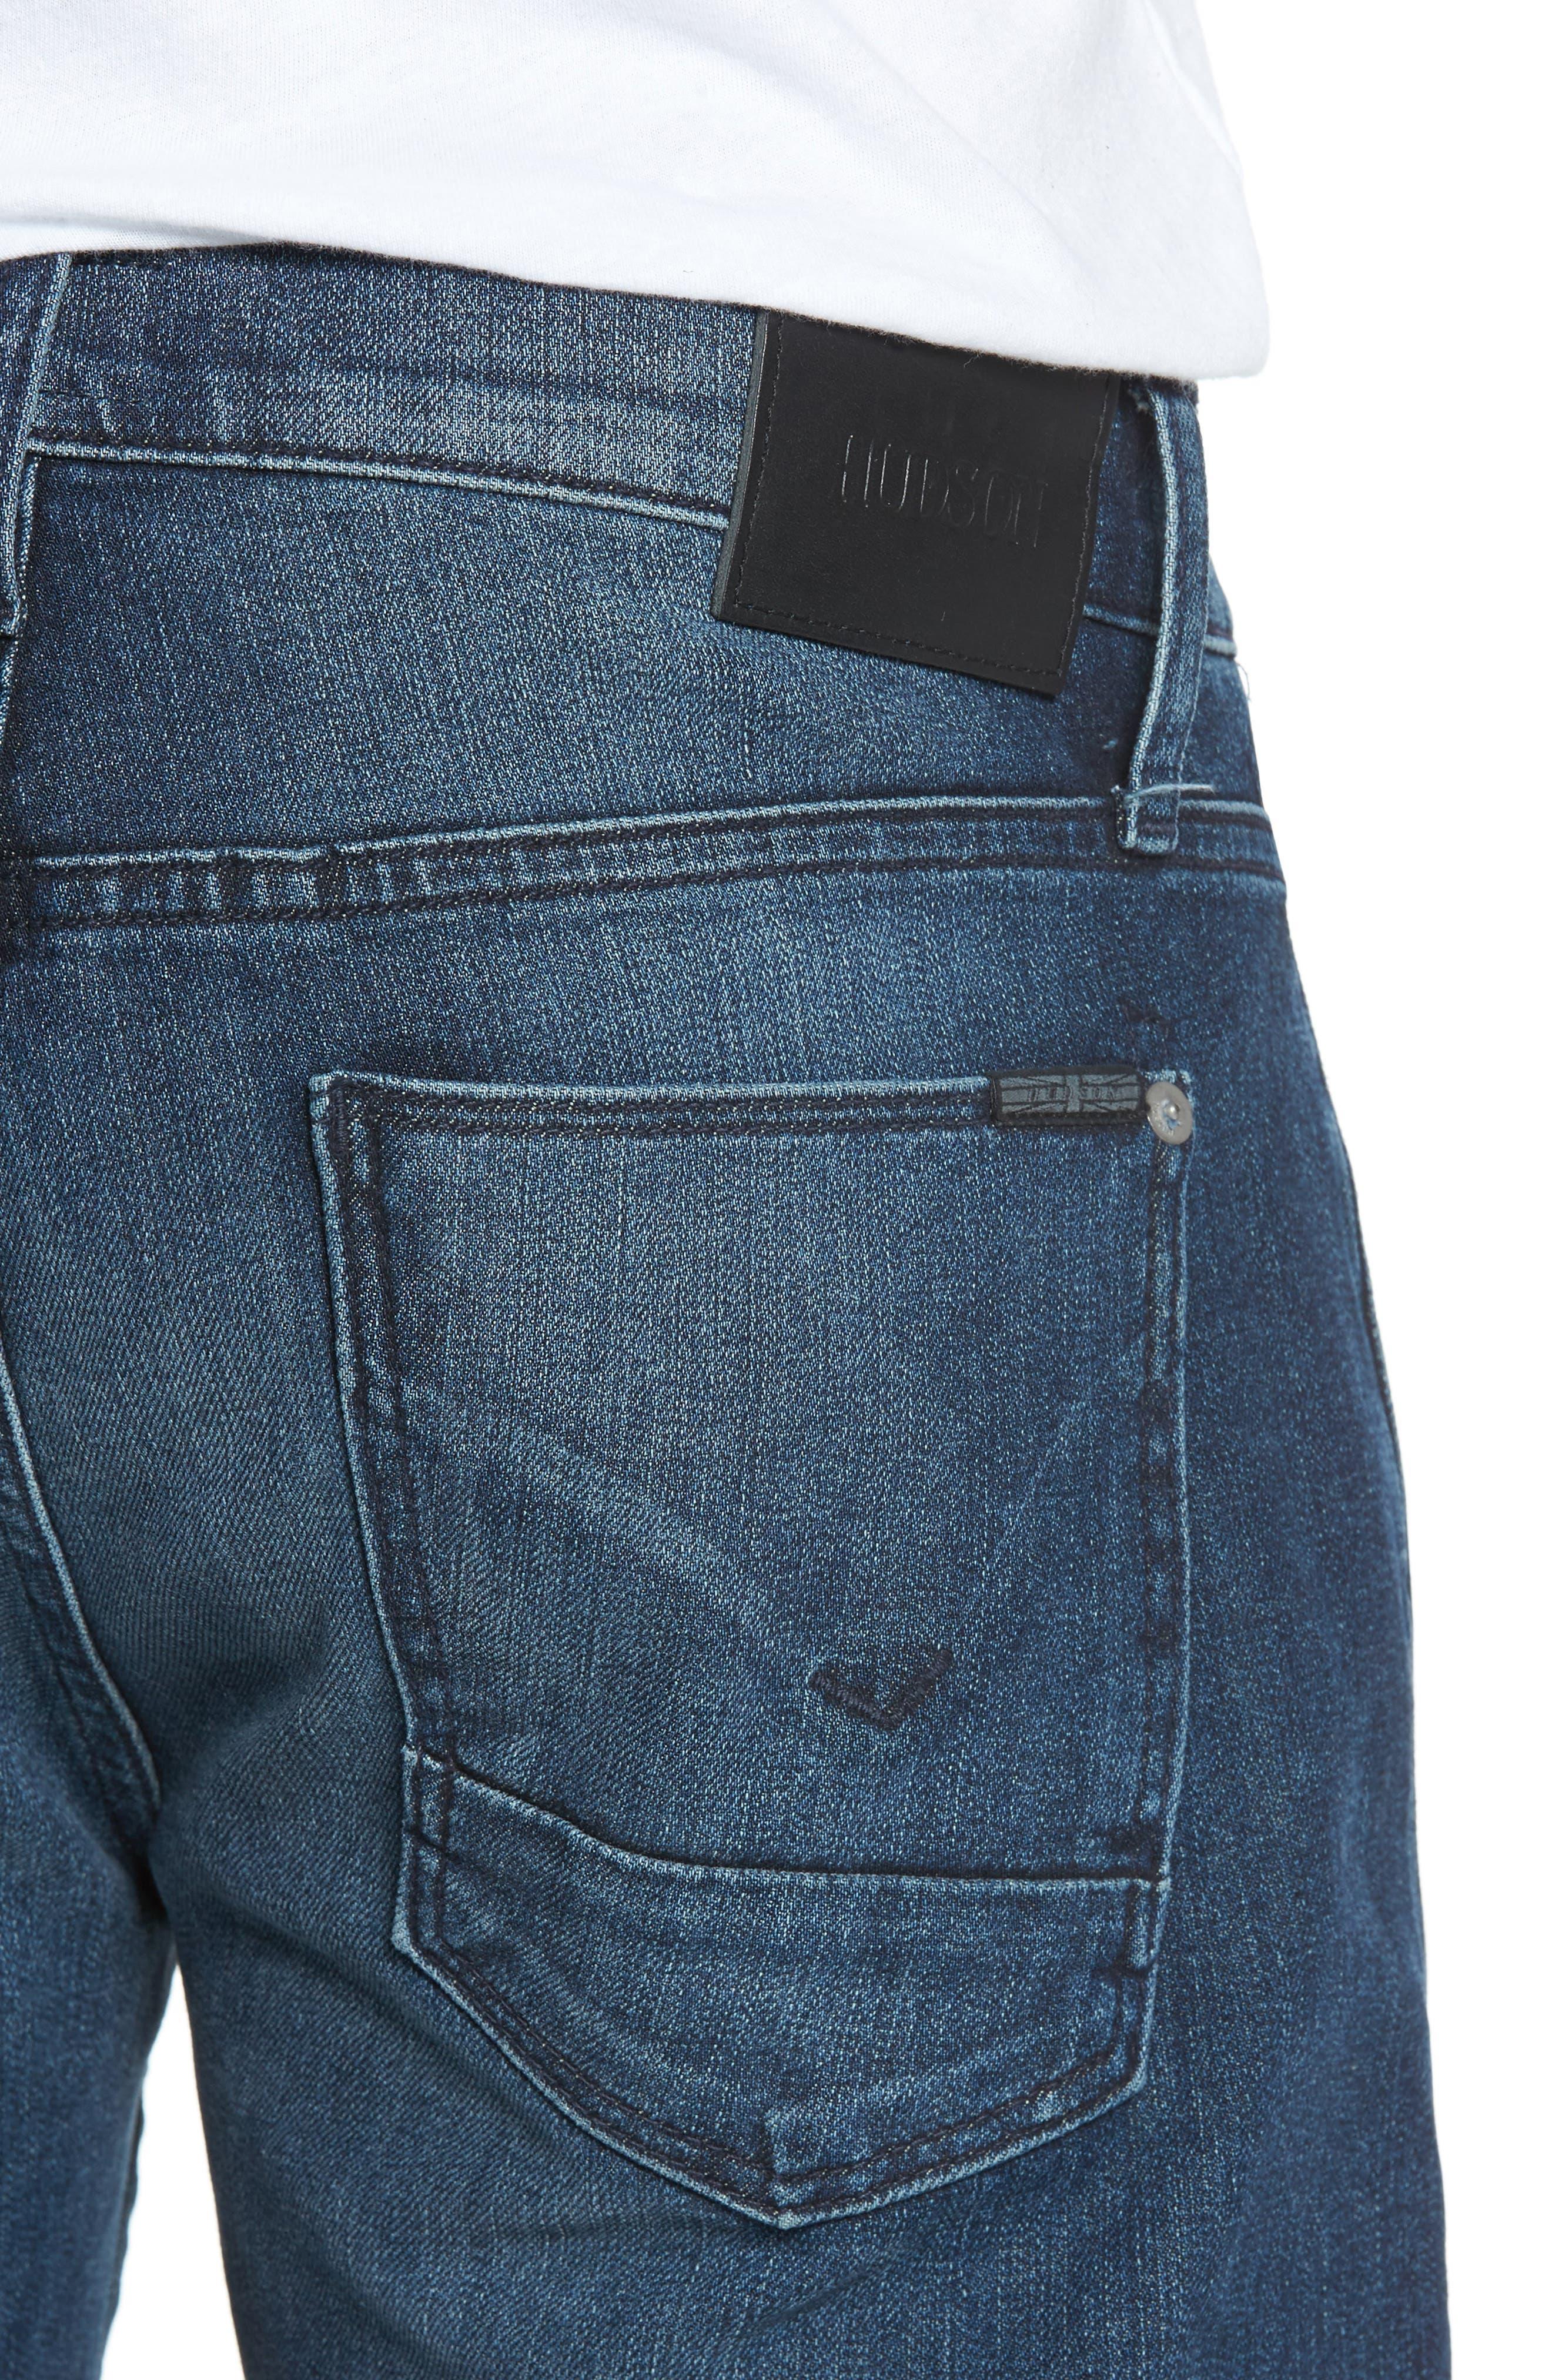 Blake Slim Fit Jeans,                             Alternate thumbnail 4, color,                             Regret